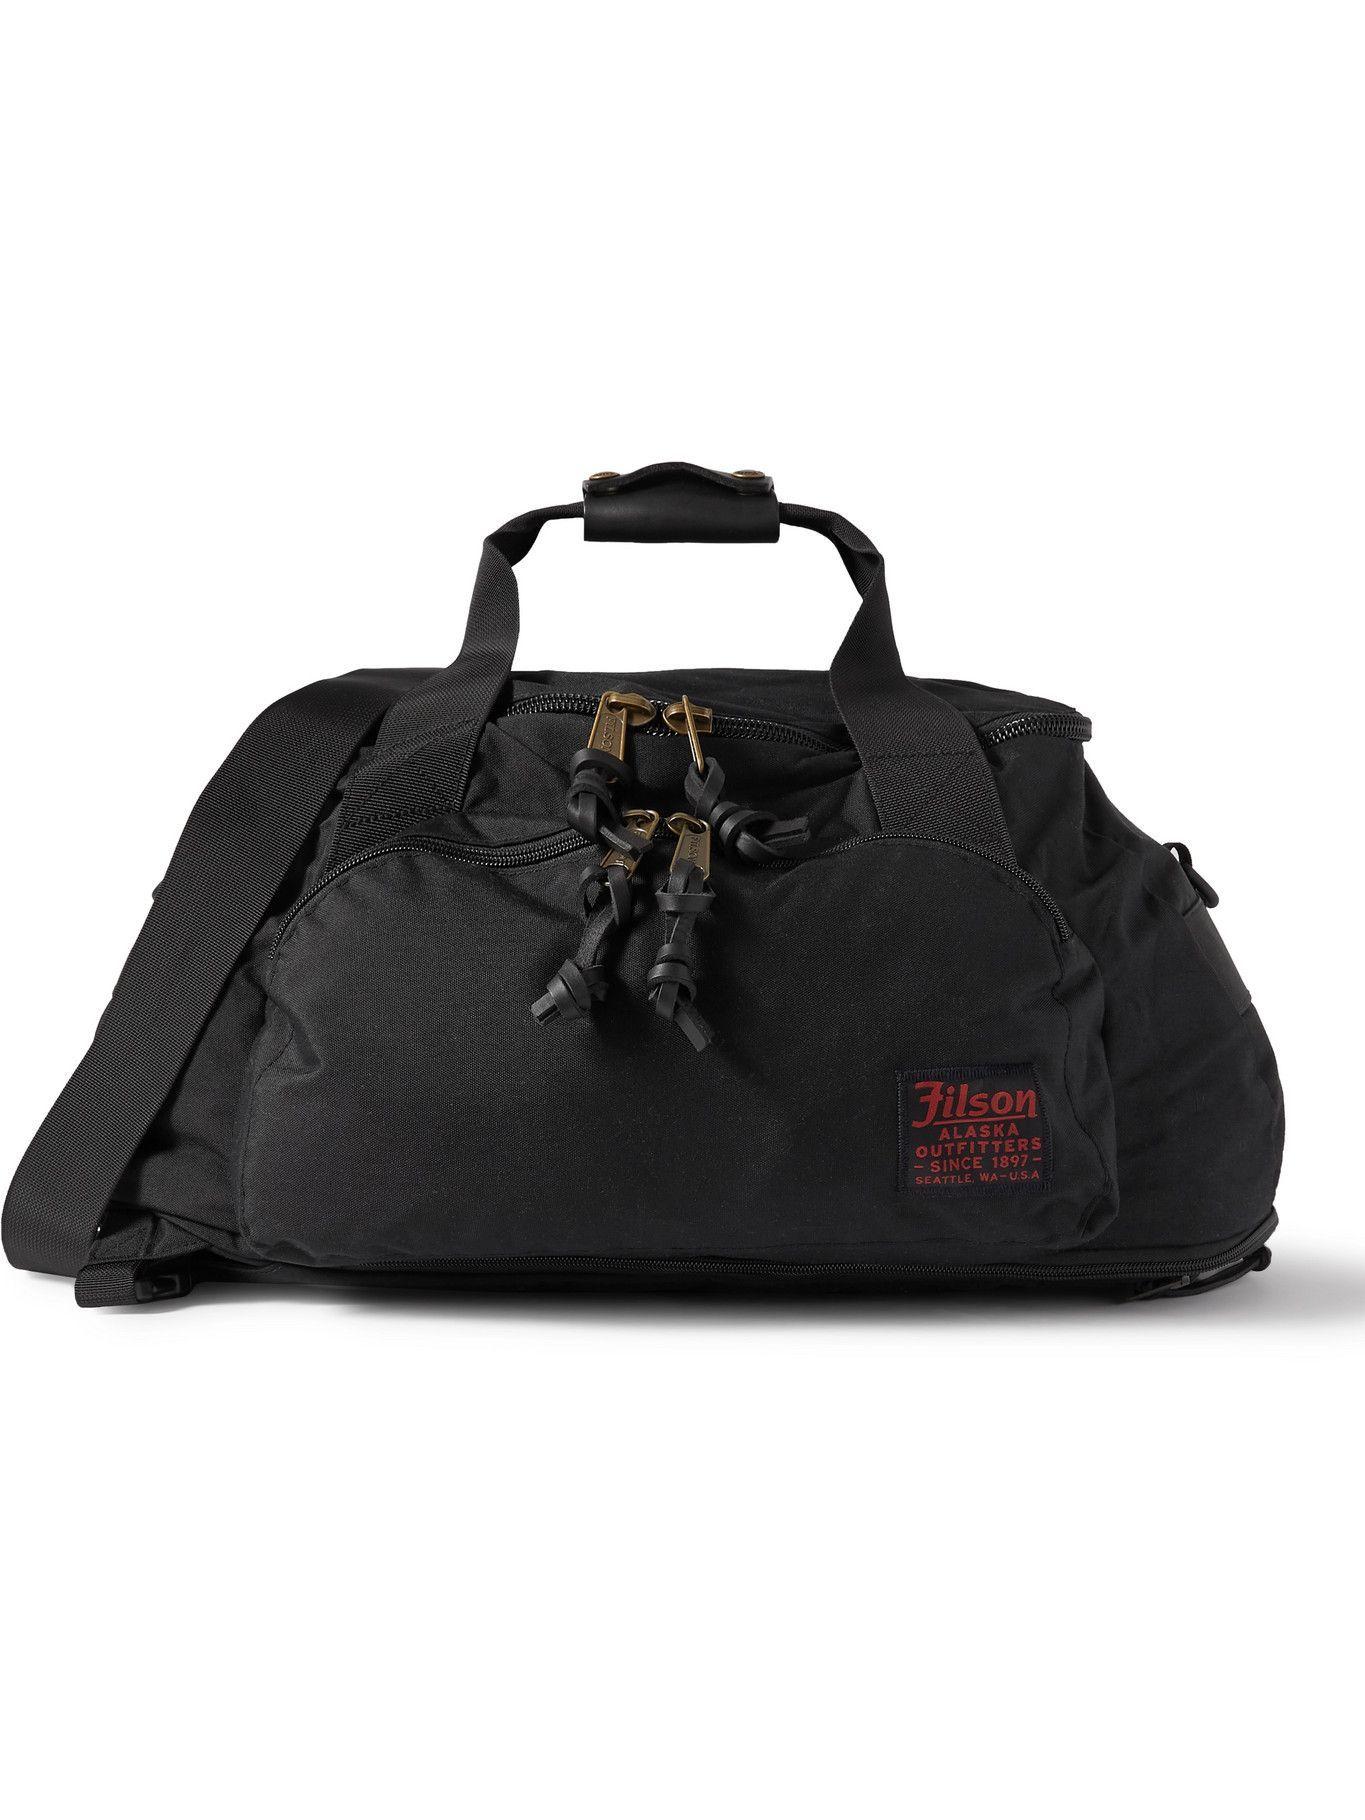 Photo: FILSON - Leather-Trimmed Nylon Duffle Bag